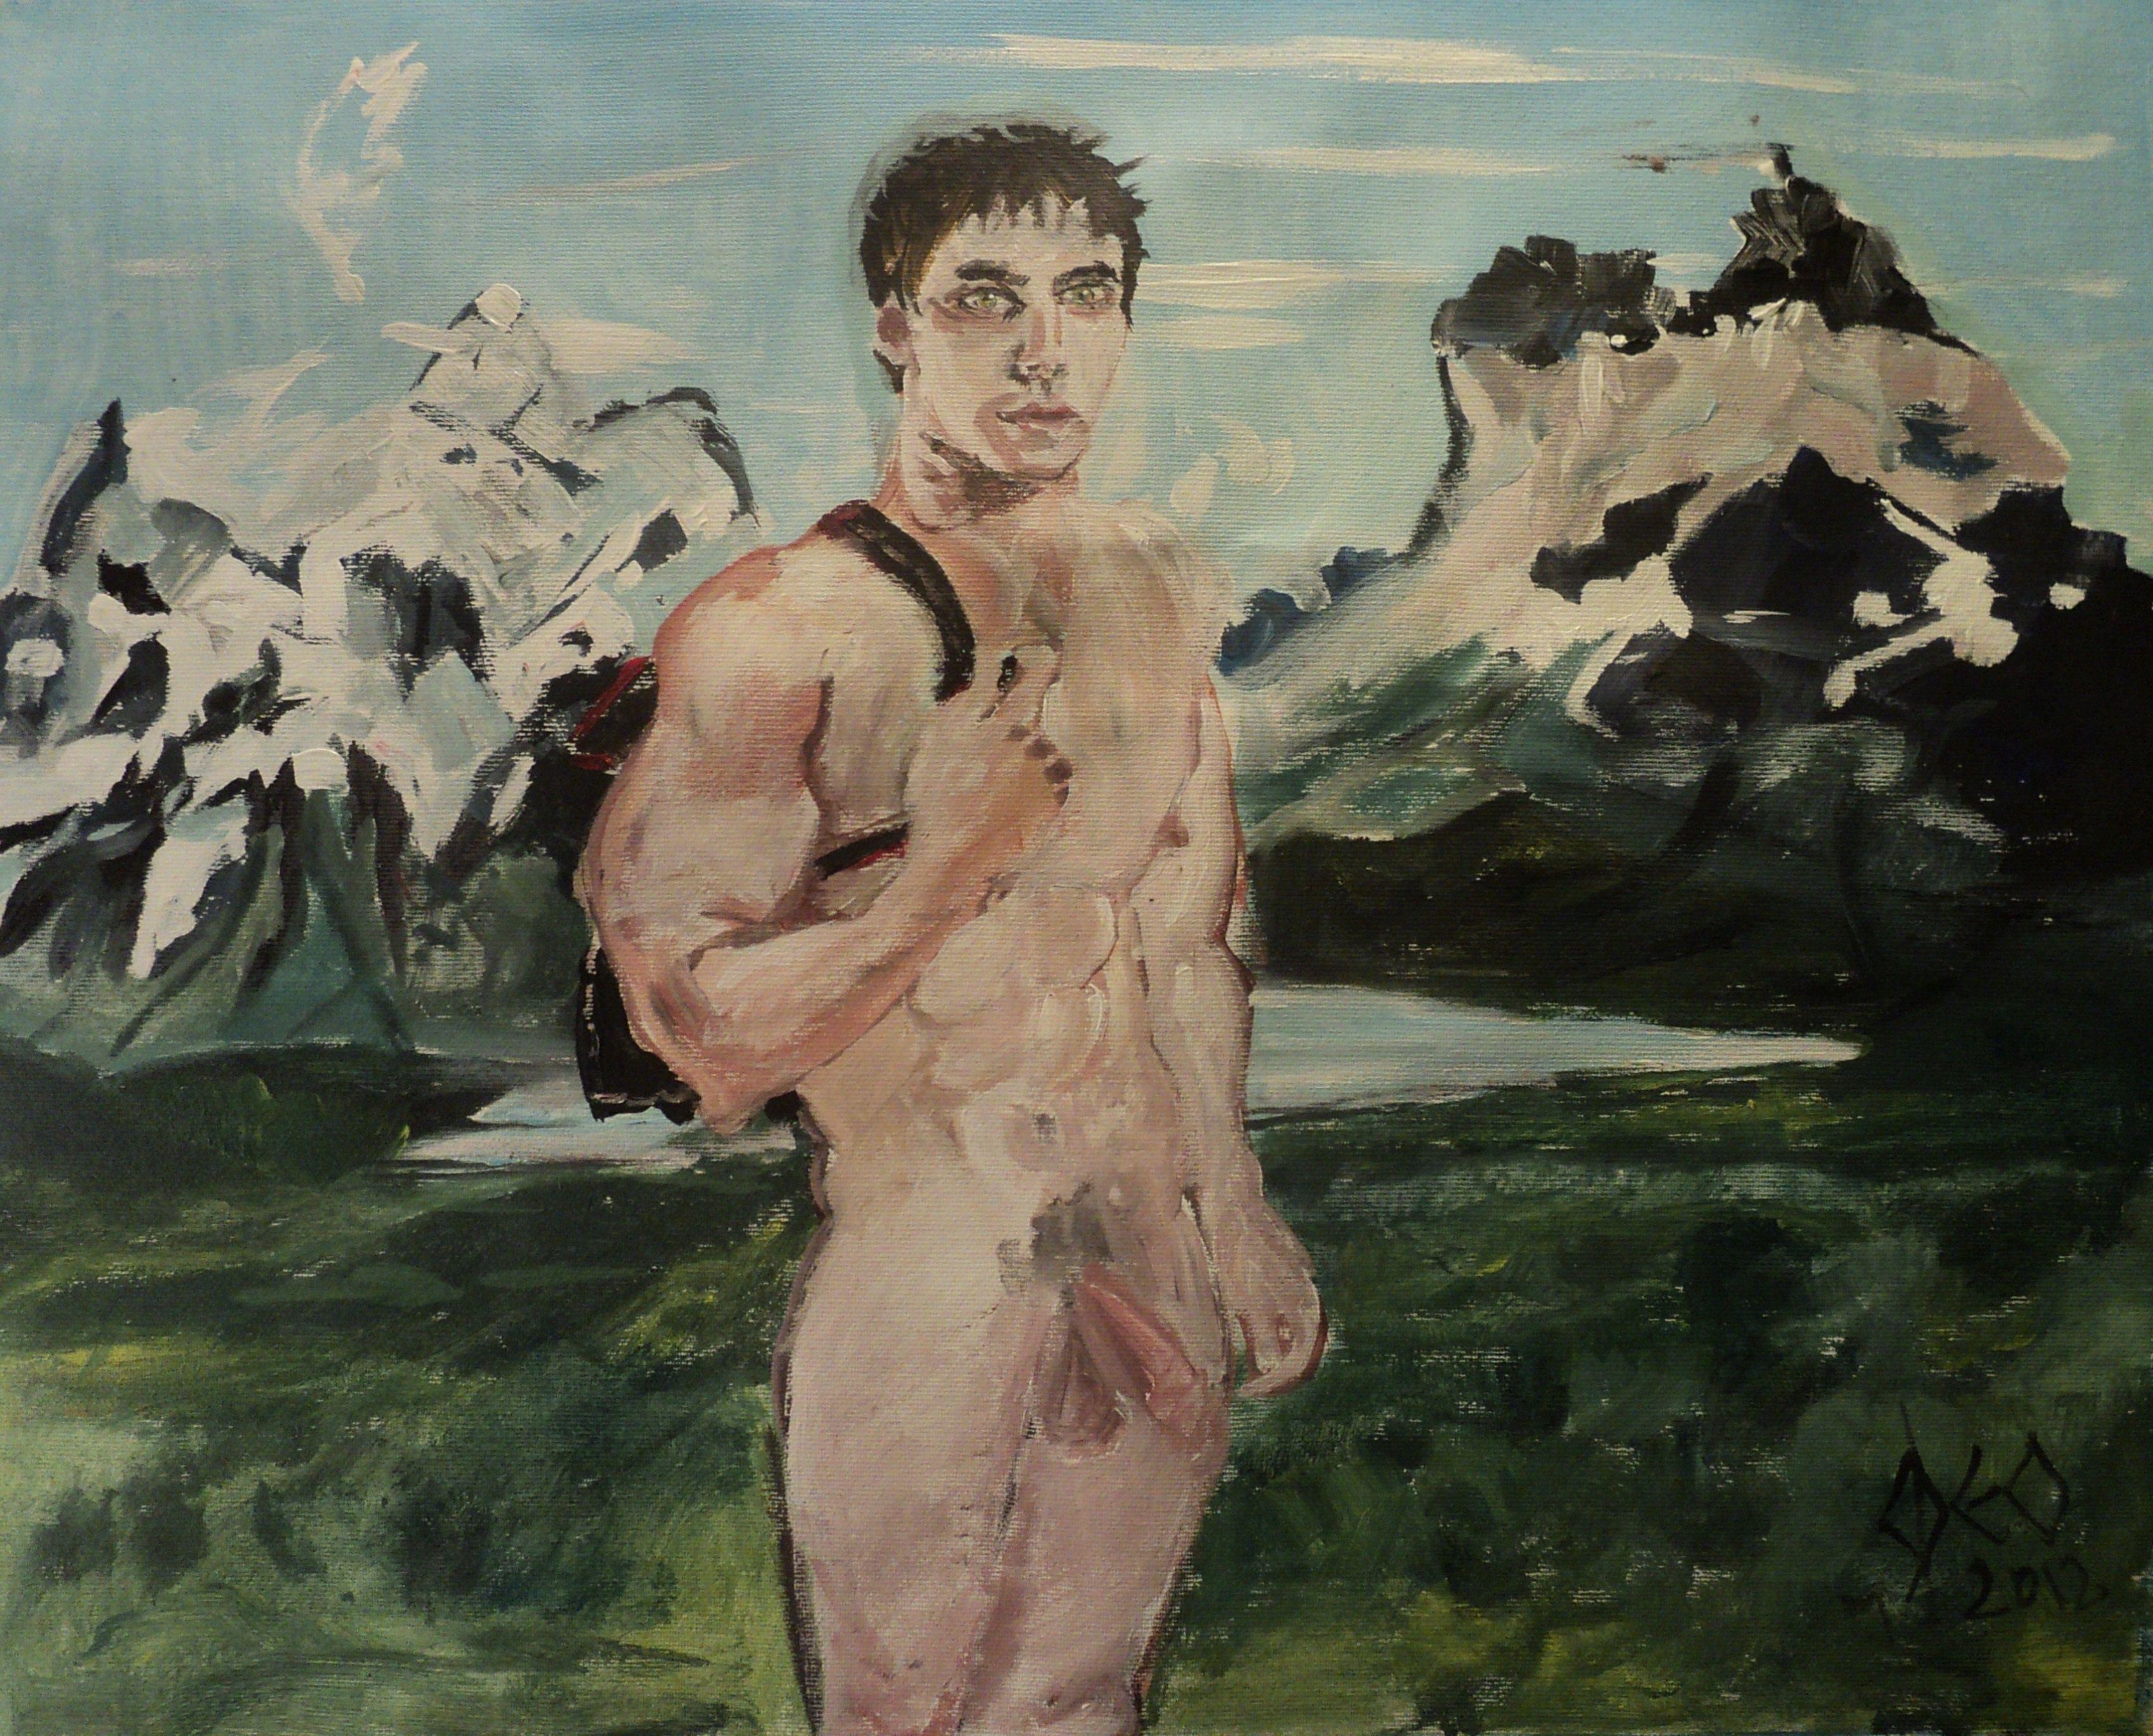 CG-010 - Le petit Berger des Andes par Cyril Georget ( 40 wide x 29 cm tall ~ 11.75 x 16.25 ) - No 05 de la série Les hombres libres - print 2 of 100 - 01-12-2012